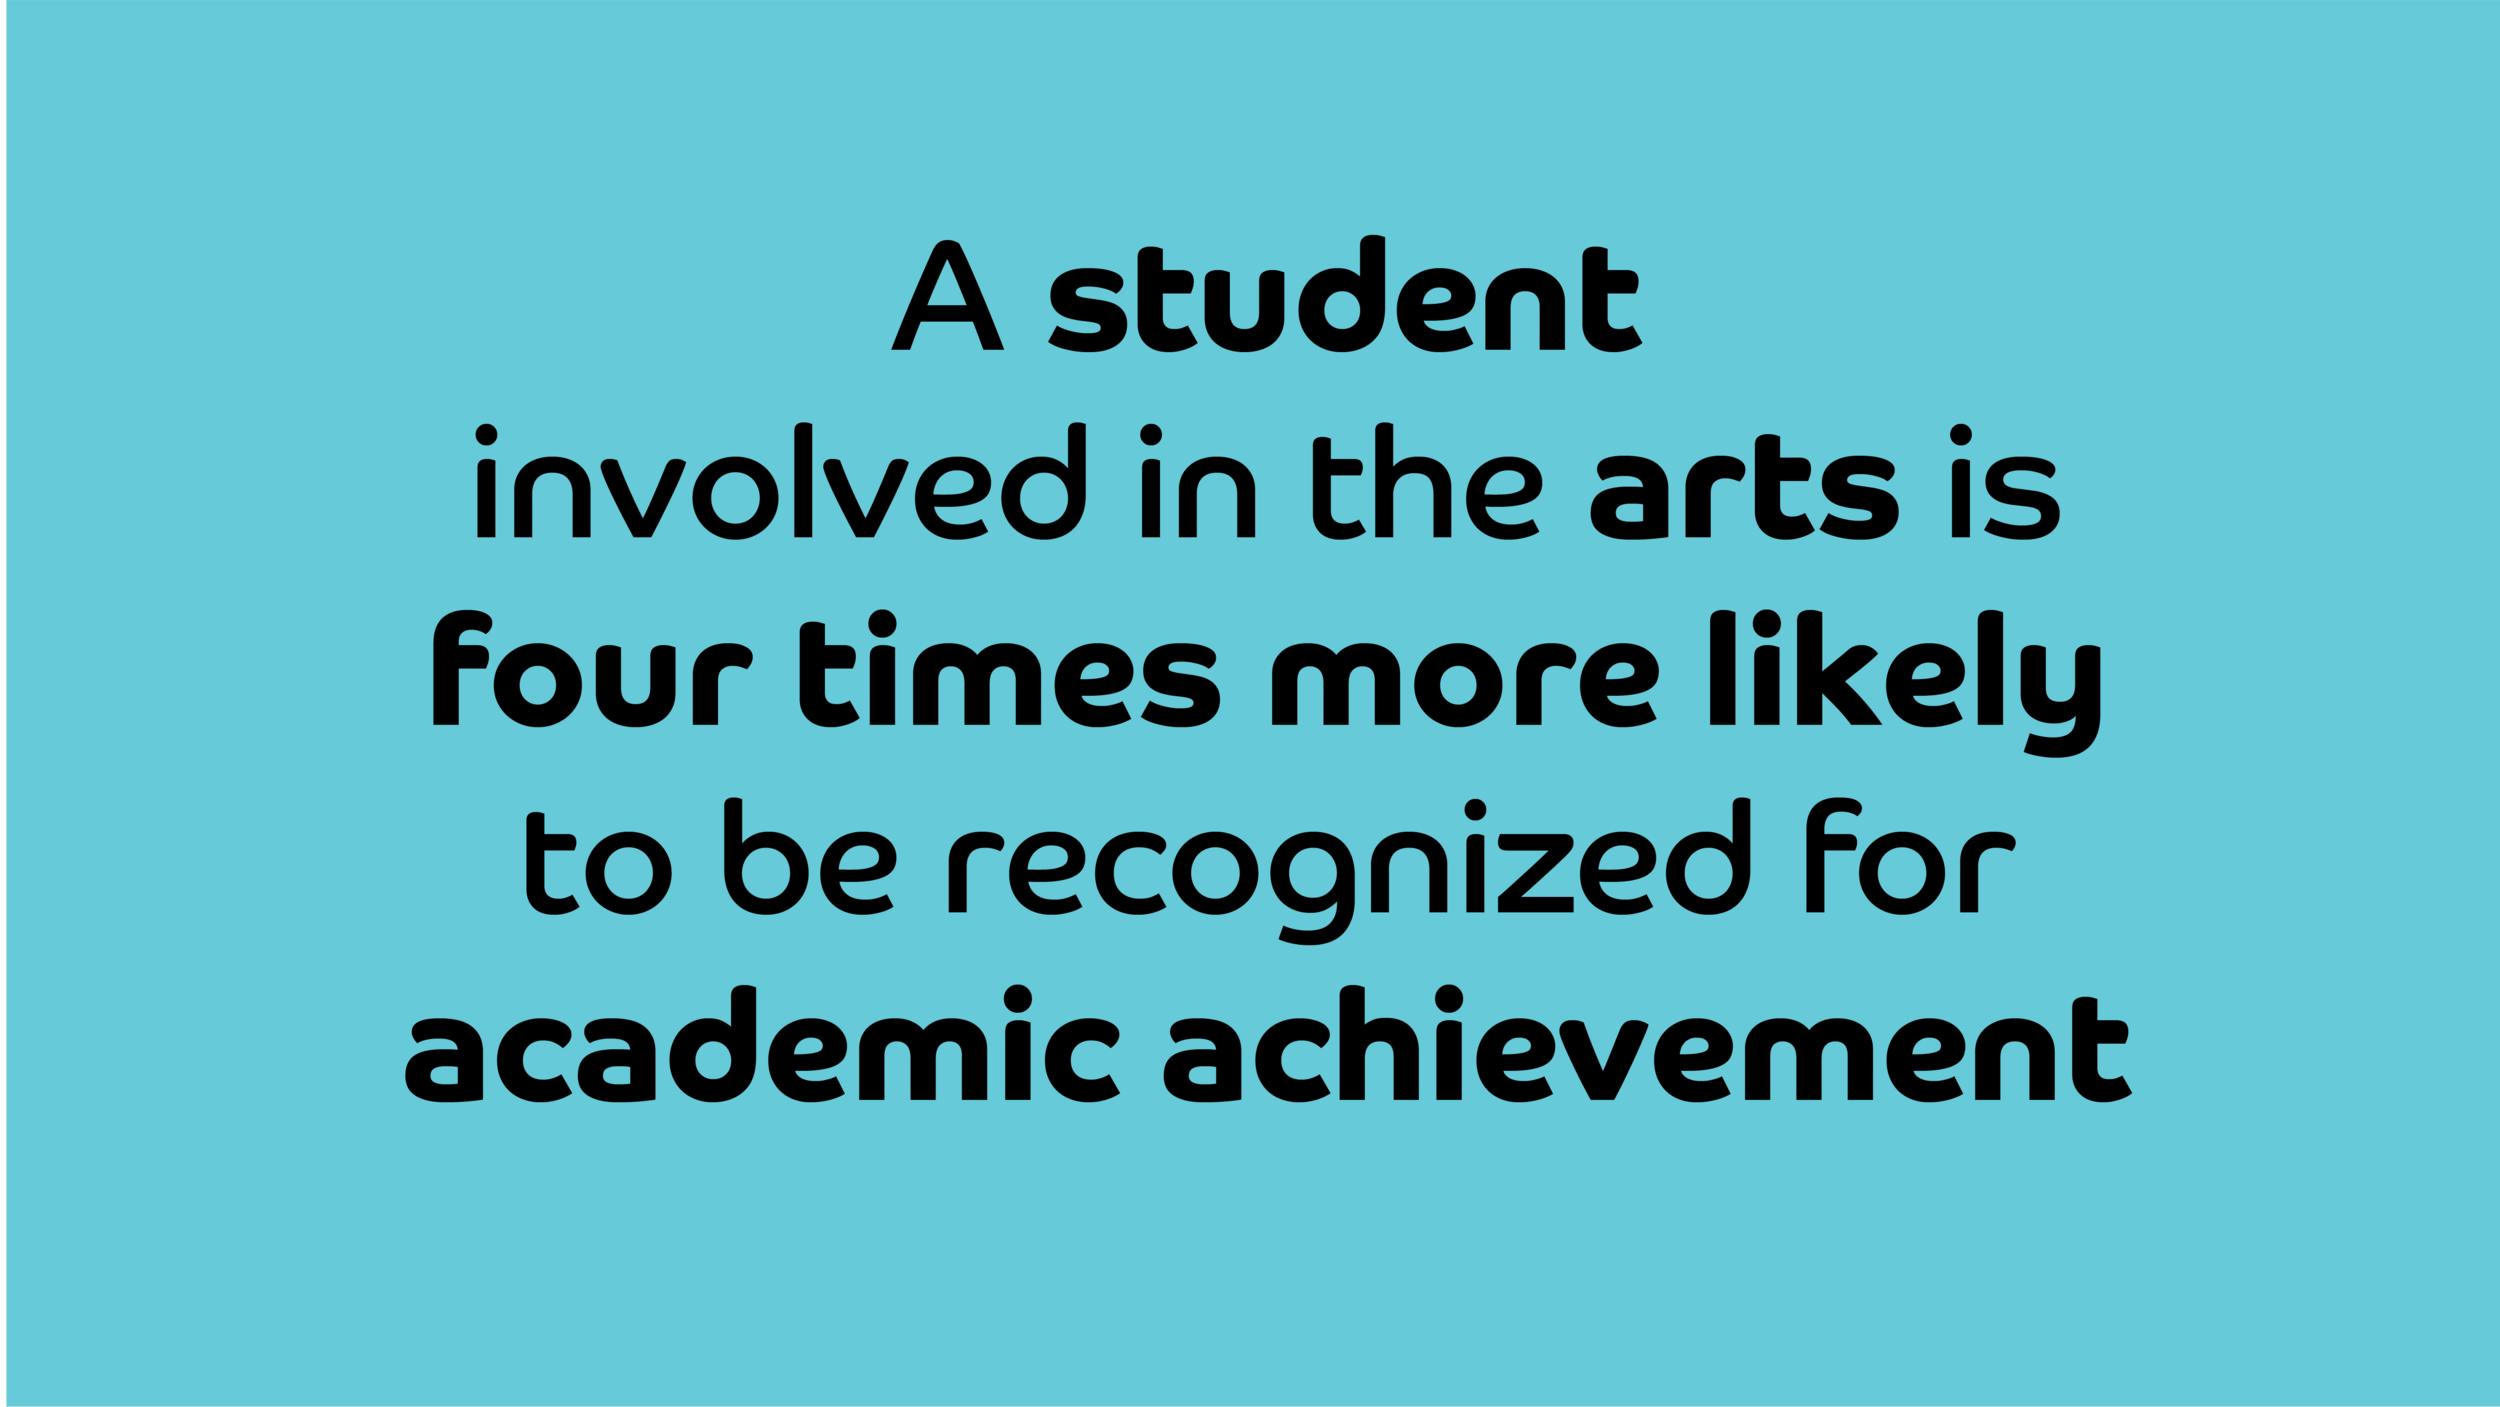 14-academic acheivement-01.png